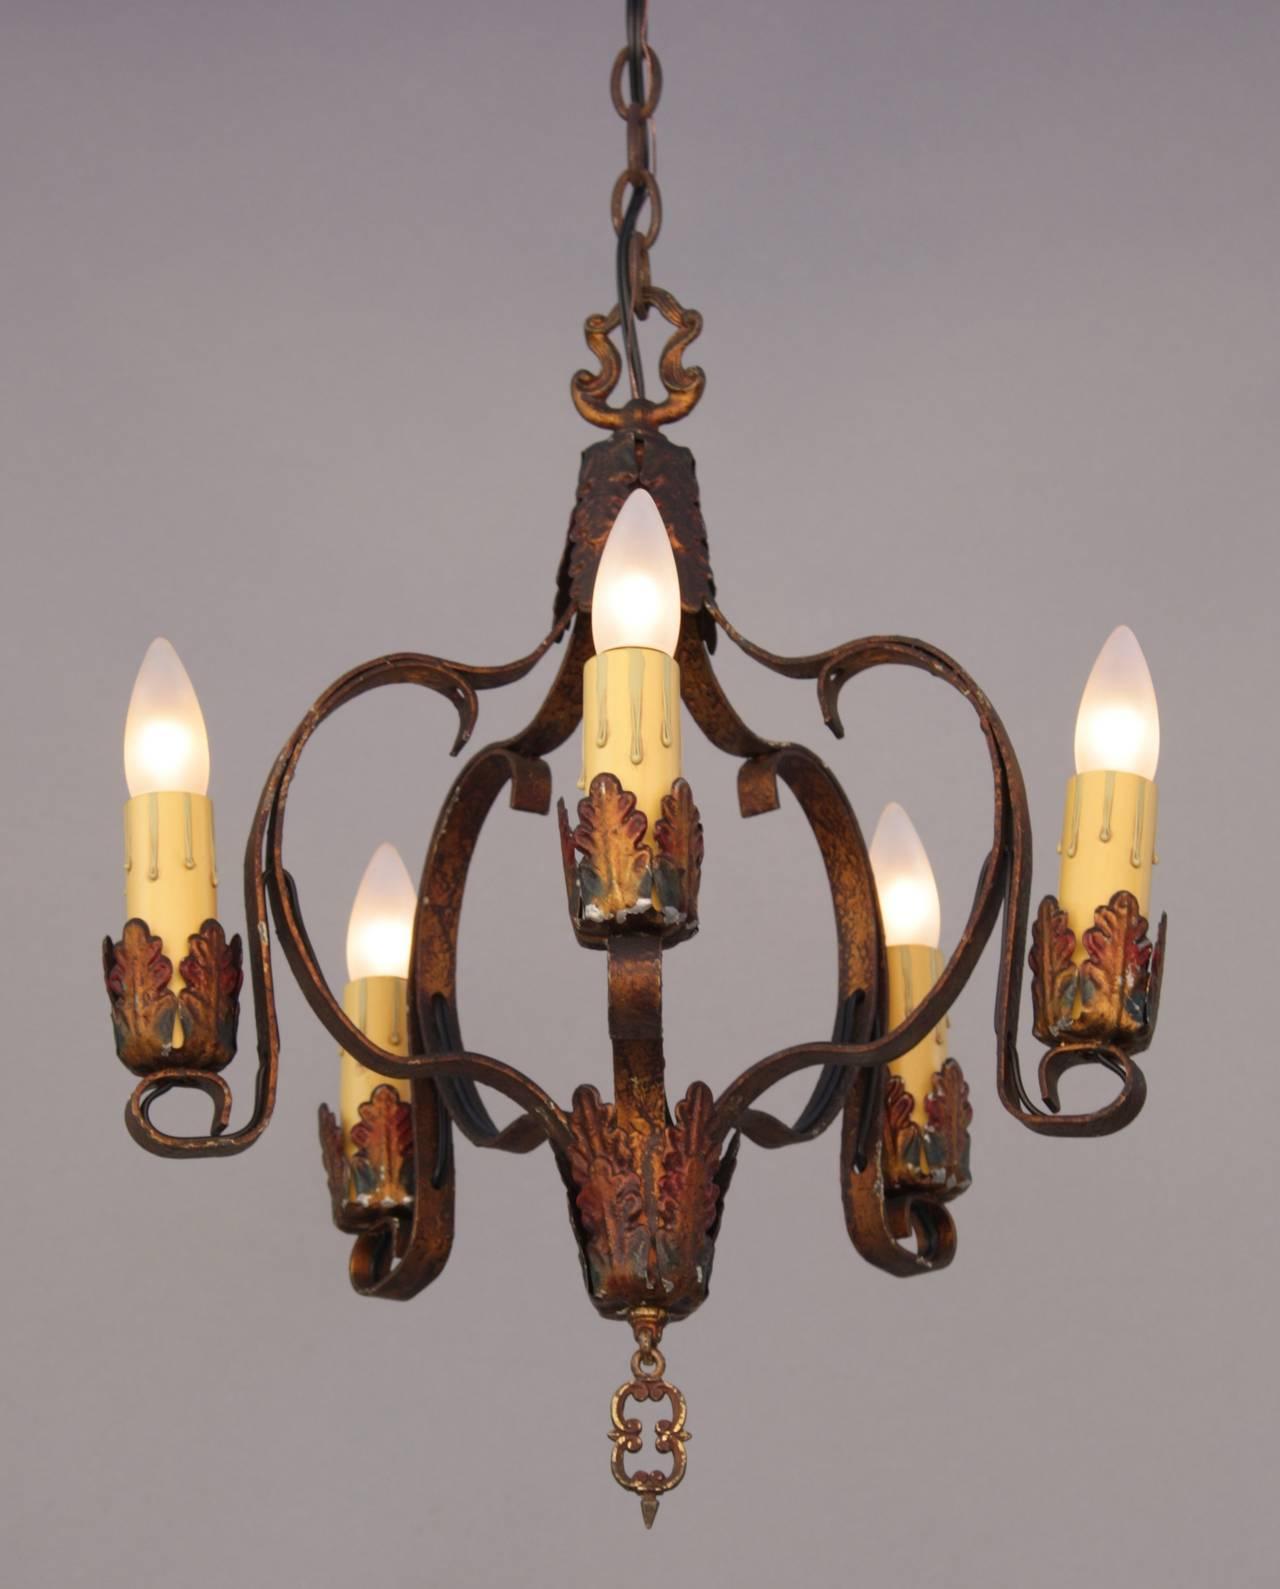 Items Similar To Lighting Rustic Chandelier Vintage 1920 S: Antique Five-Light Polychrome Spanish Revival Chandelier